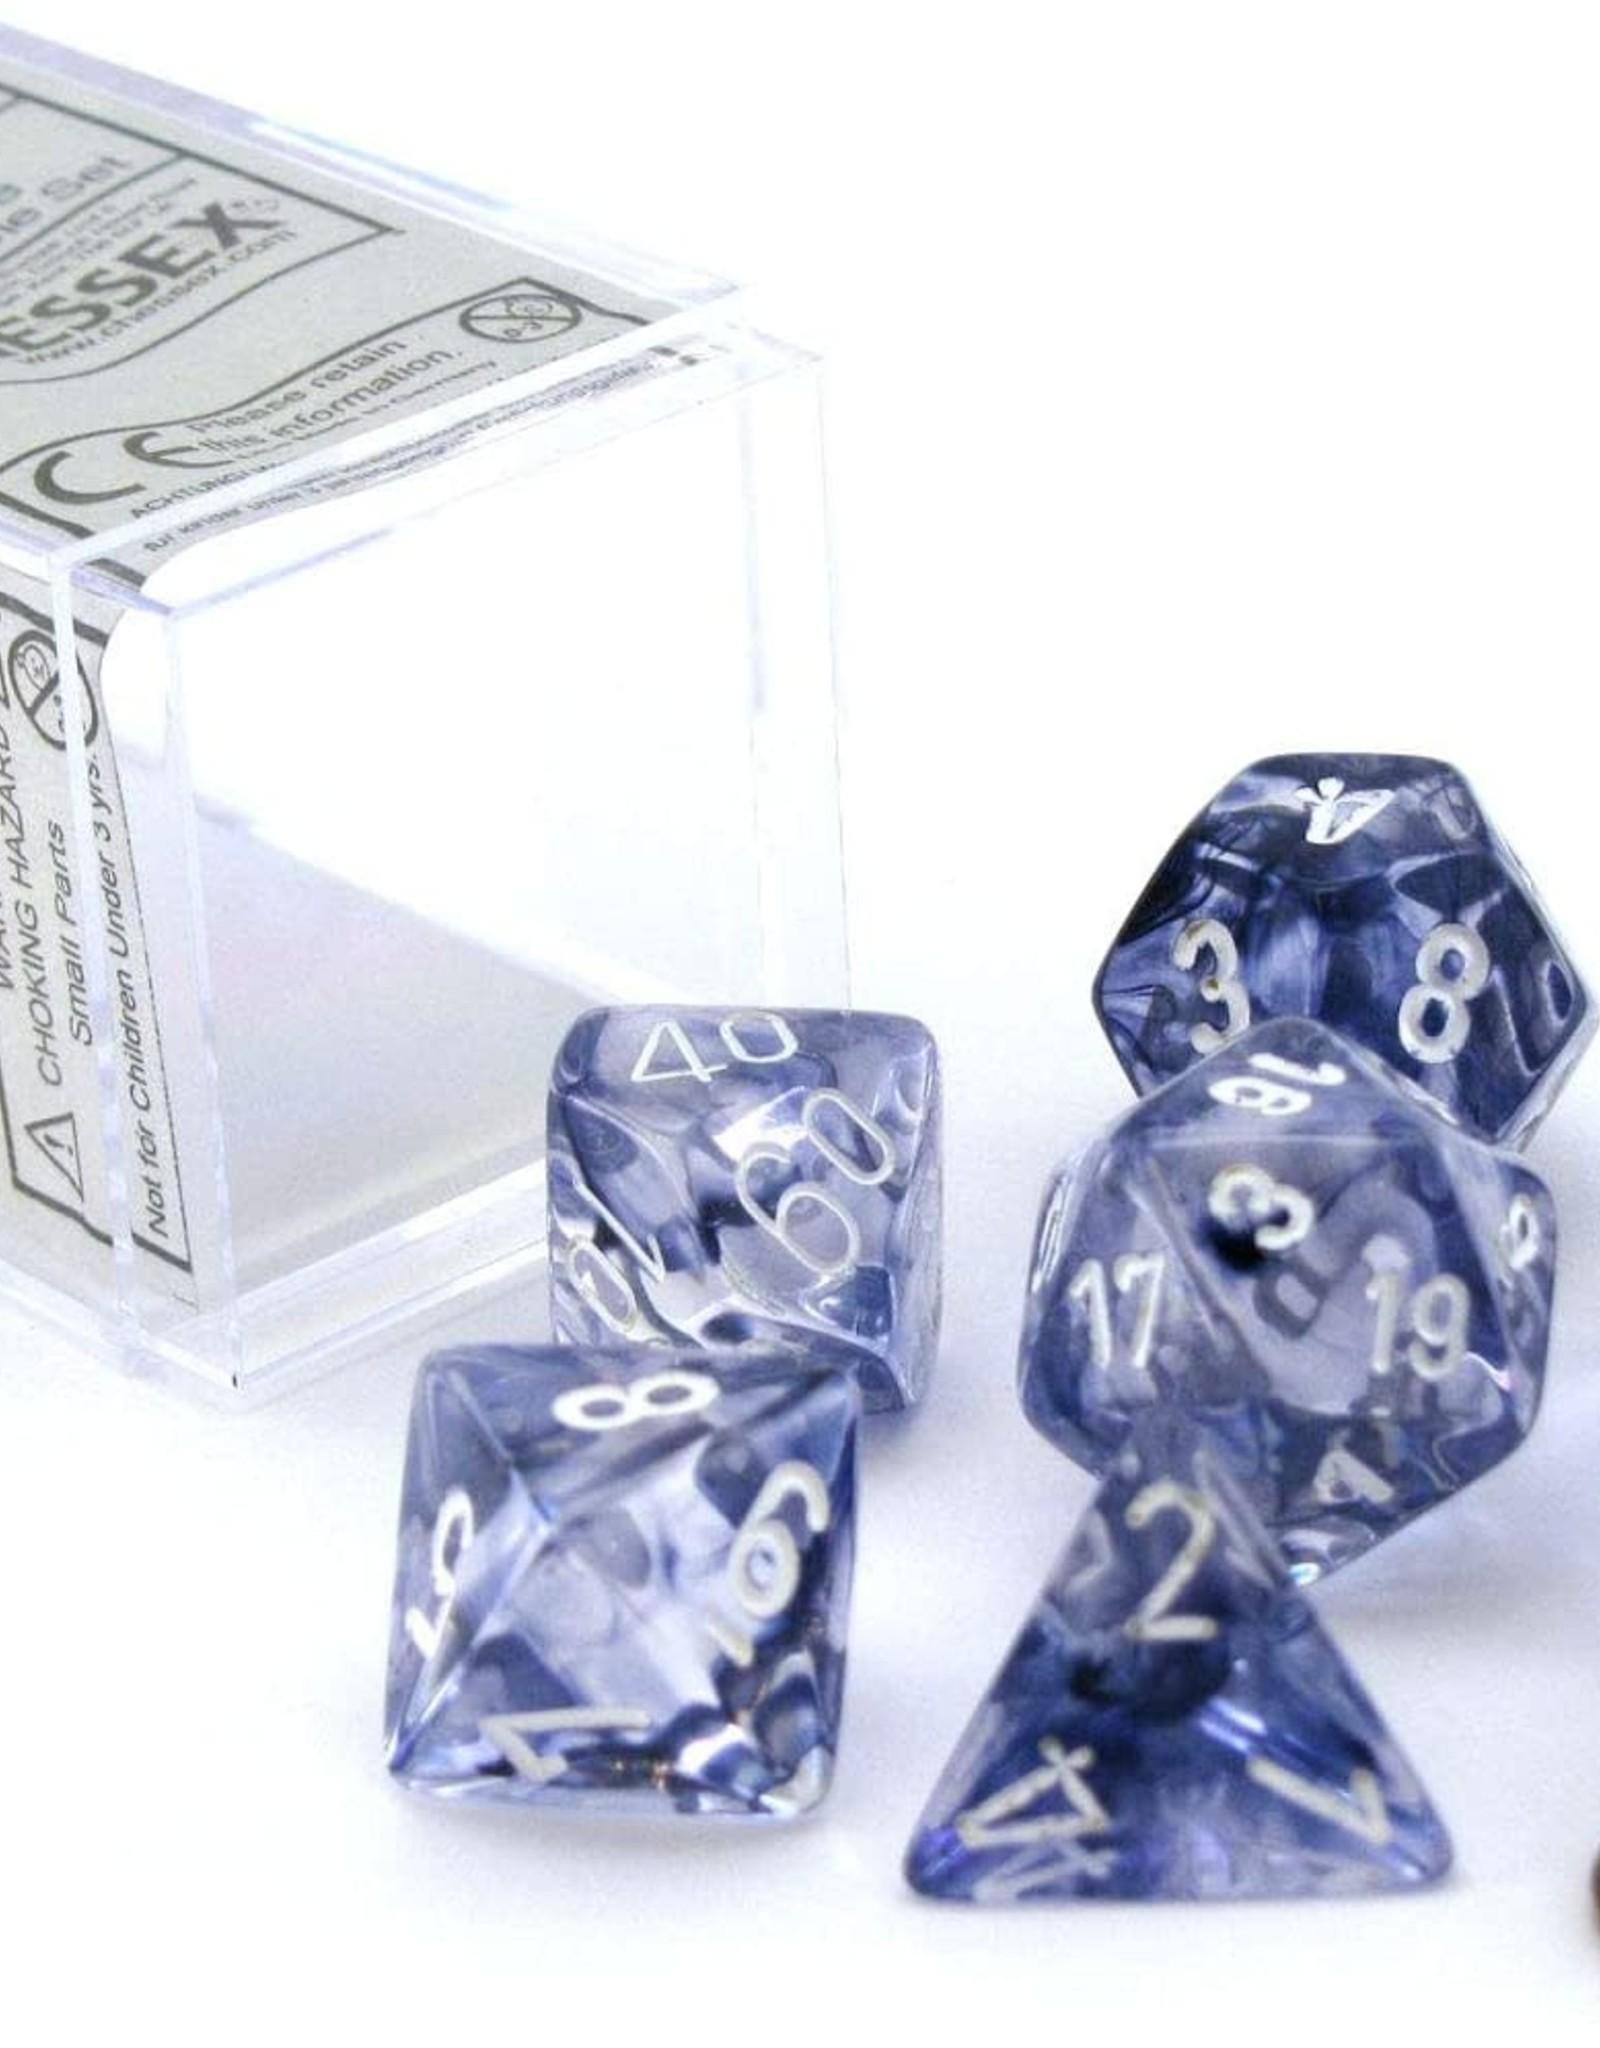 Chessex Chessex Nebula Black 7 piece dice set CHX-27408